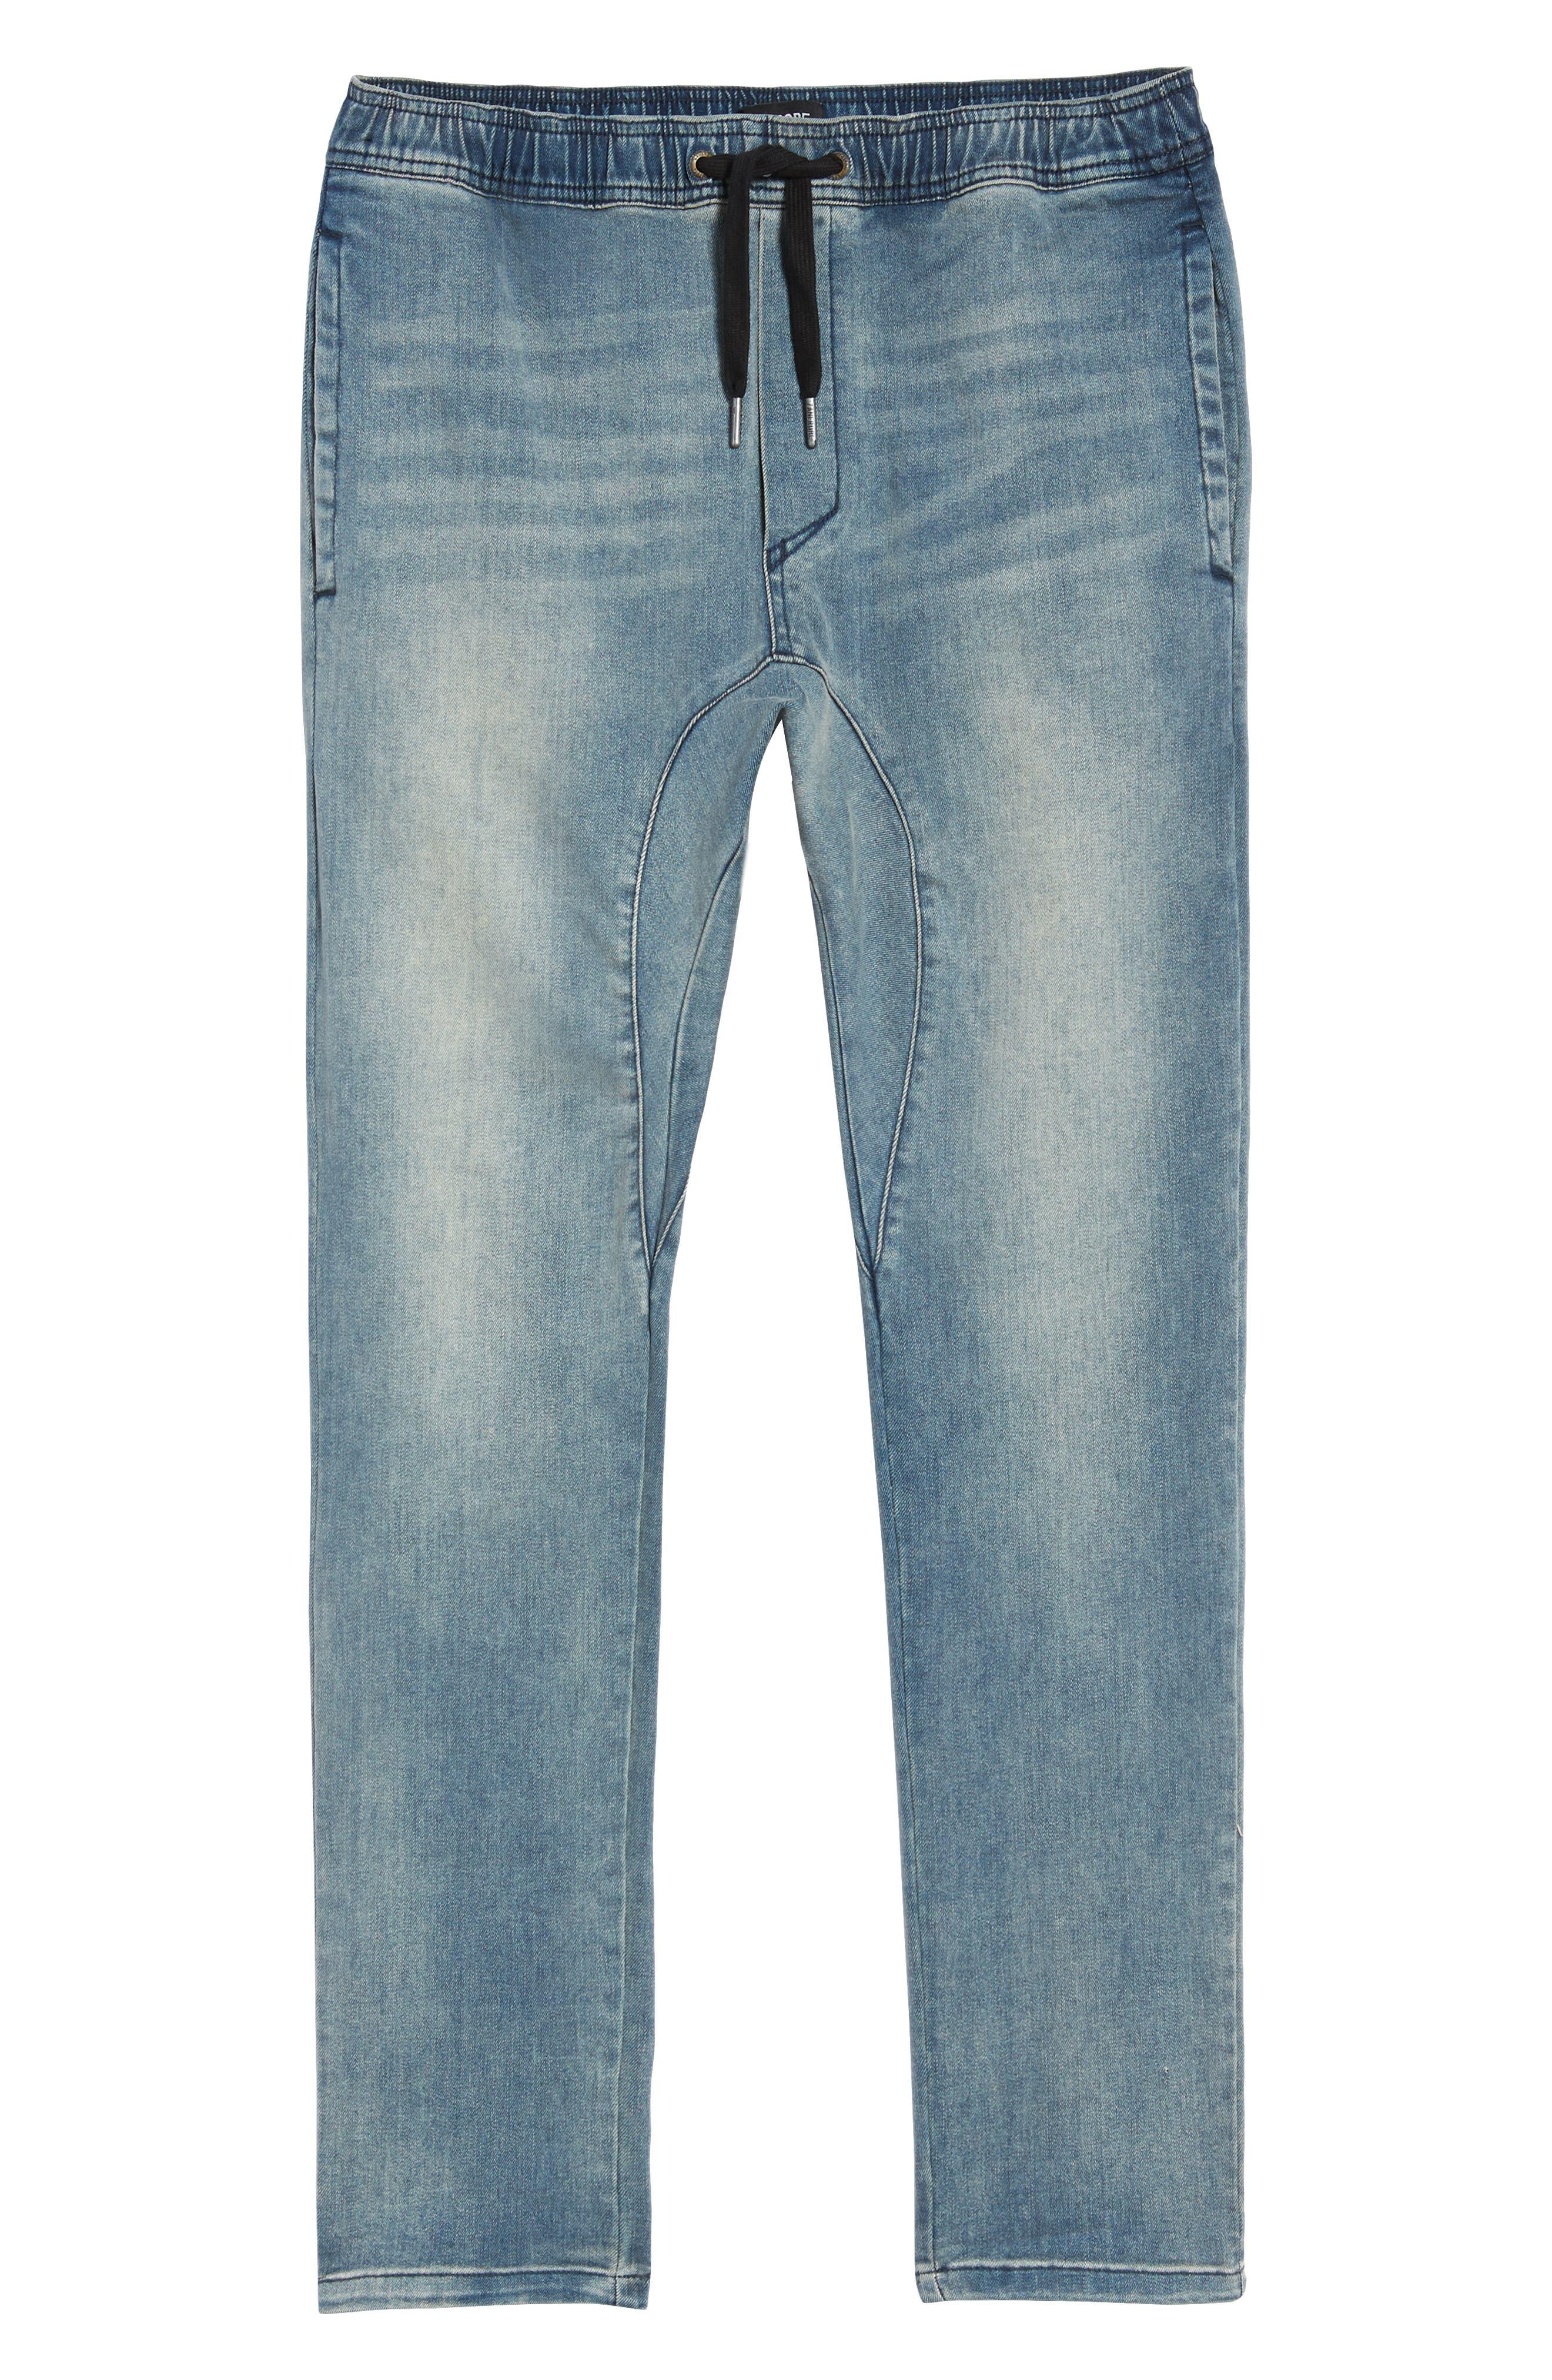 Salerno Flex Jeans,                             Alternate thumbnail 6, color,                             ABANDONED BLUE